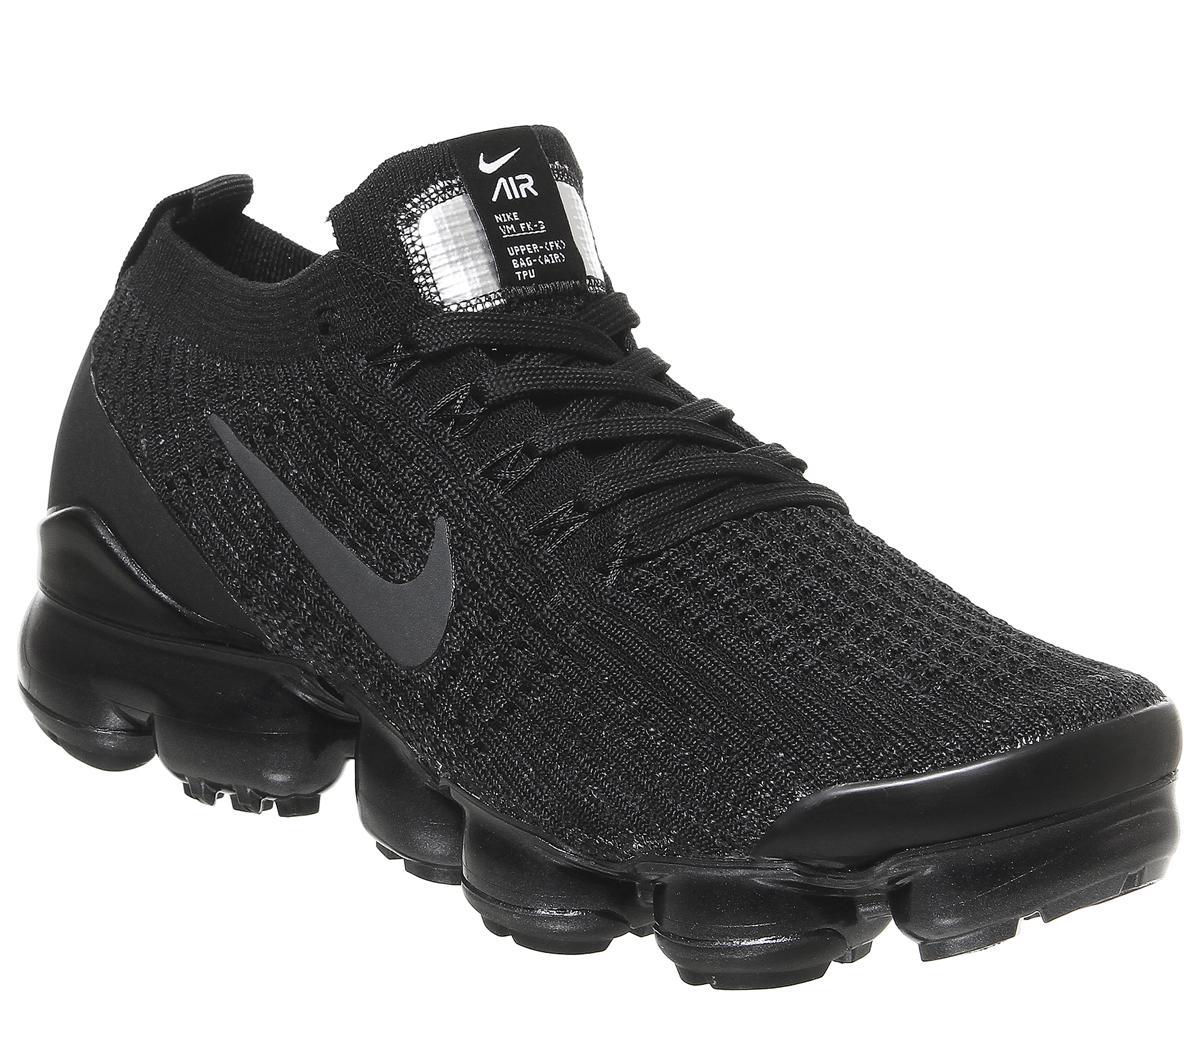 Atravesar Elaborar patrón  Nike Air Vapormax Fk 3 Trainers Black Anthracite White Metallic Silver F -  Hers trainers